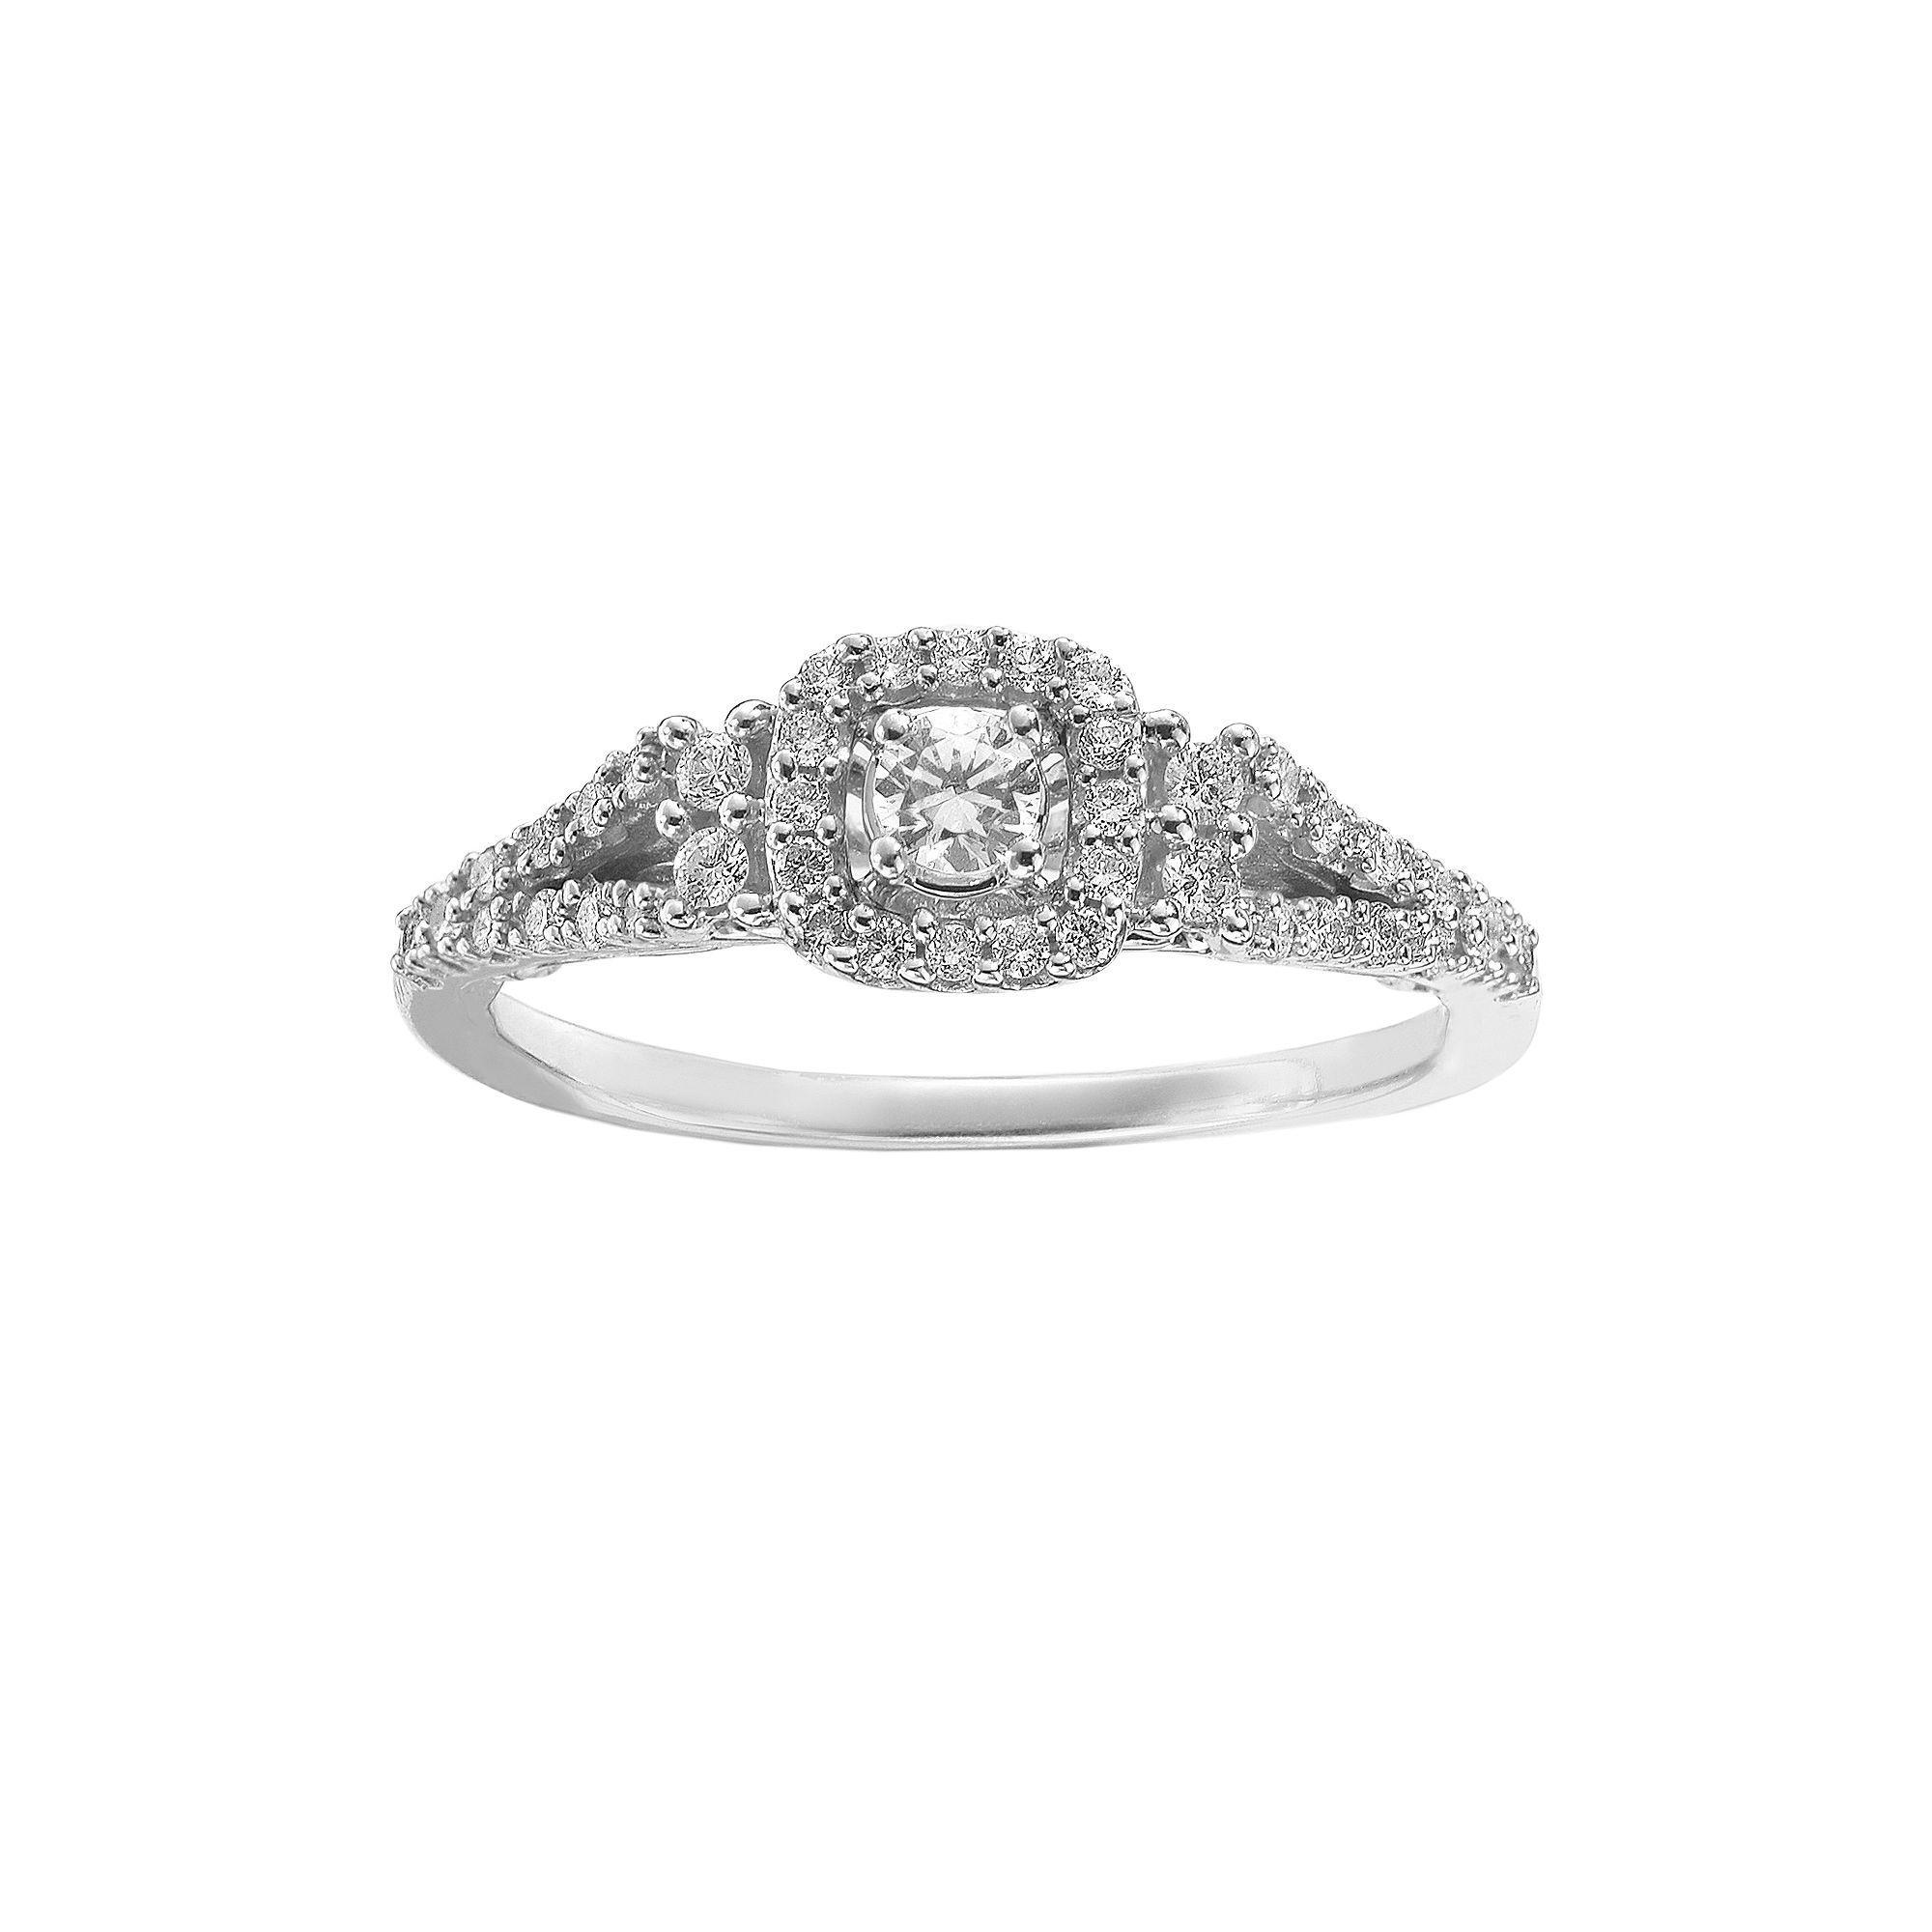 Simply Vera Vera Wang Diamond Halo Engagement Ring in 14k White